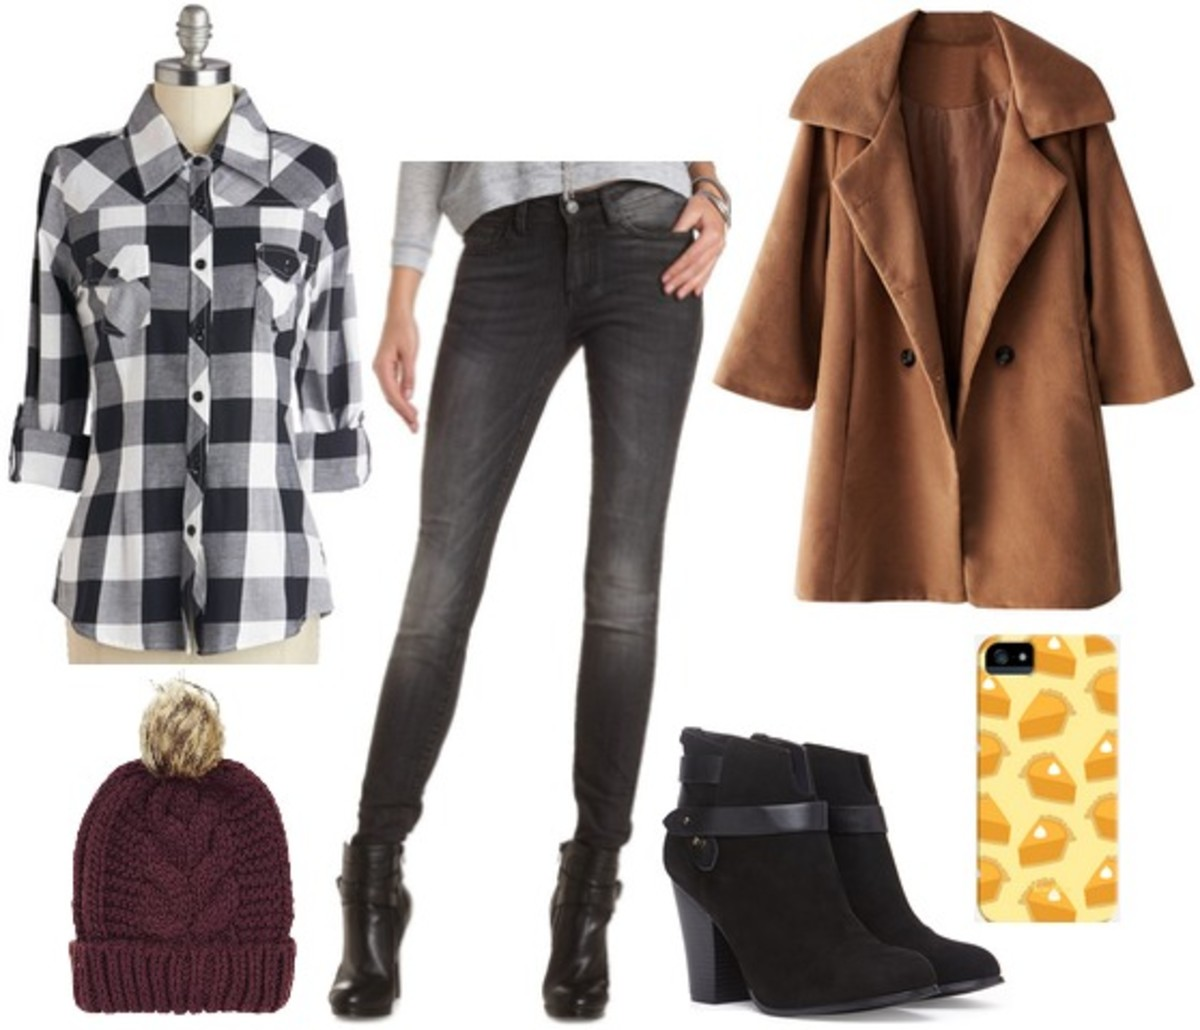 black-skinny-jeans-camel-jacket-coat-black-shoe-booties-beanie-black-plaid-shirt-thanksgivingoutfit-fall-winter-weekend.jpg